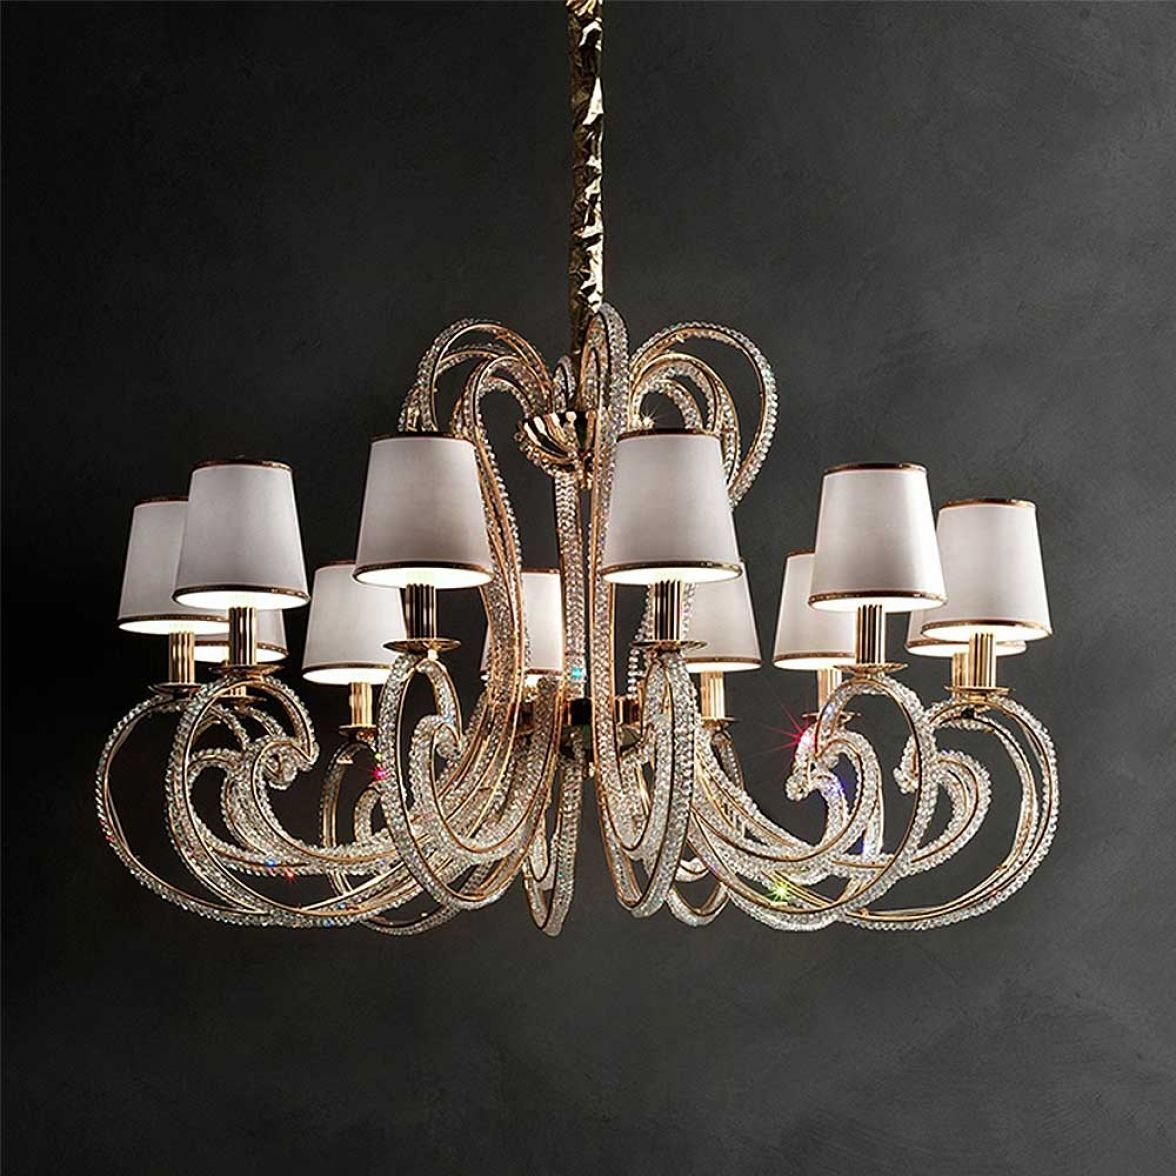 cristalis GOLD chandelier